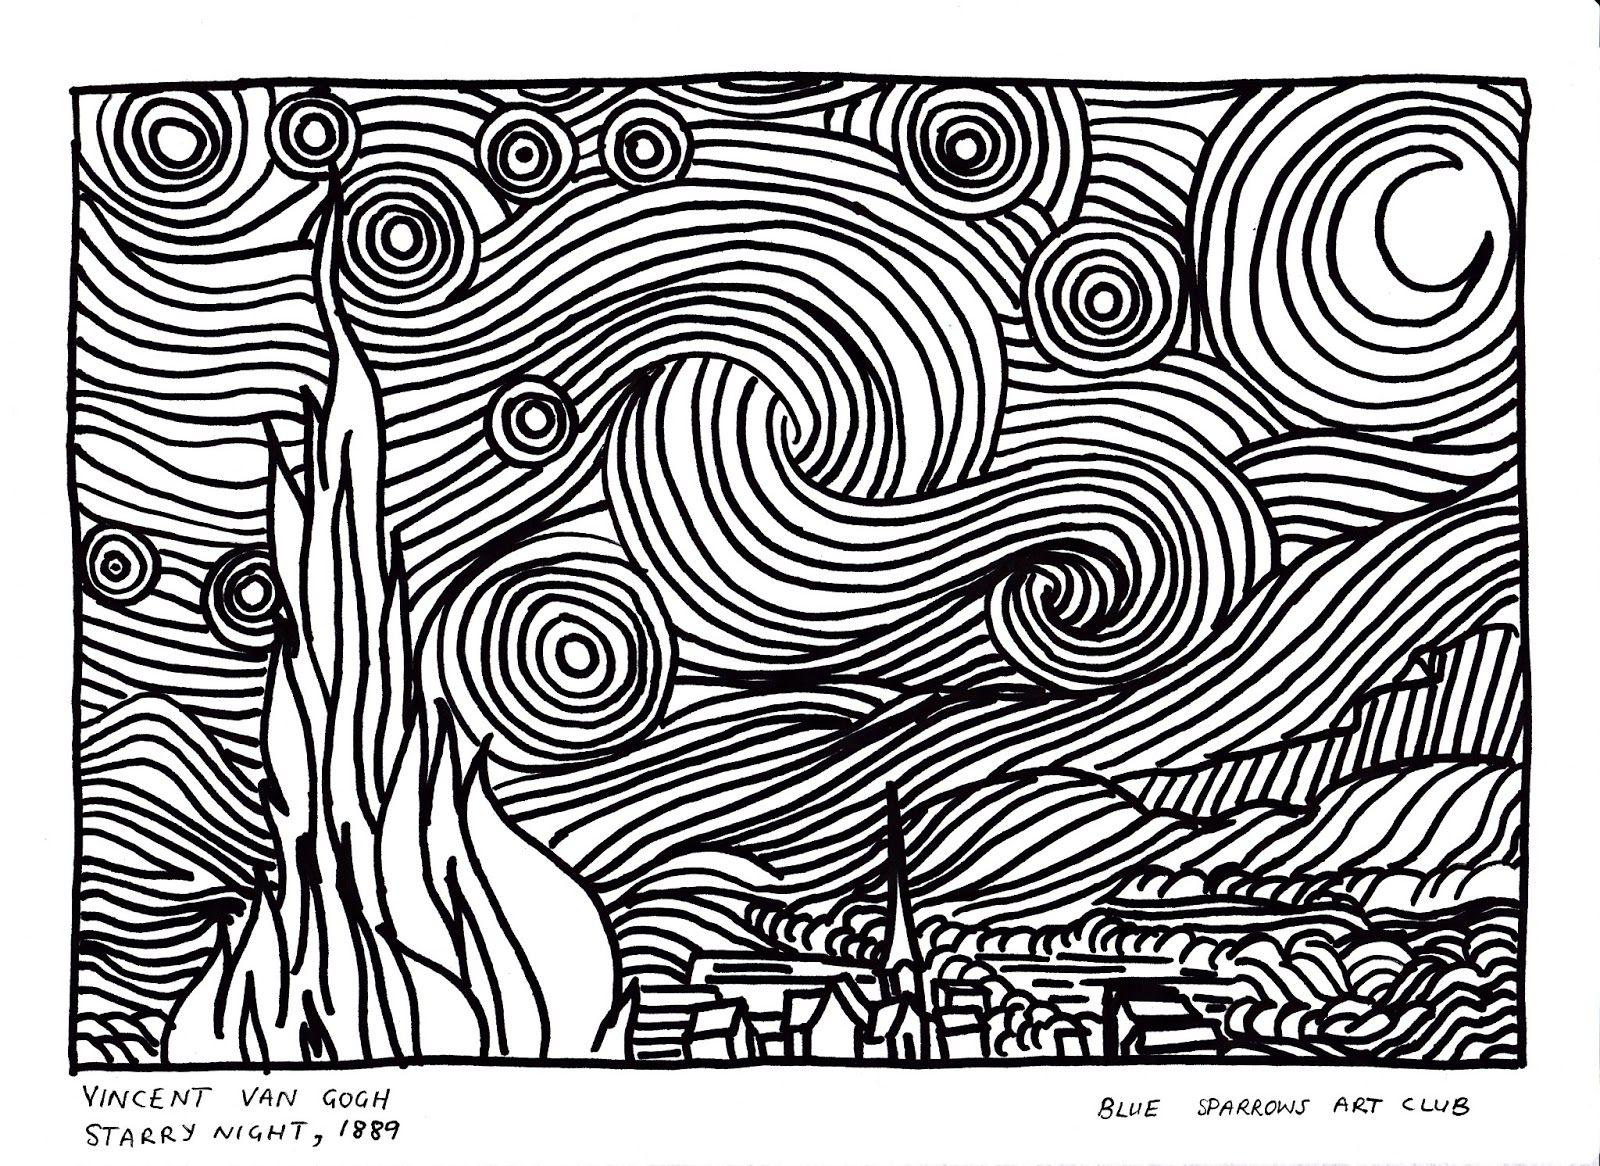 Van Gogh Starry Night Coloring Page Vincent Van Gogh